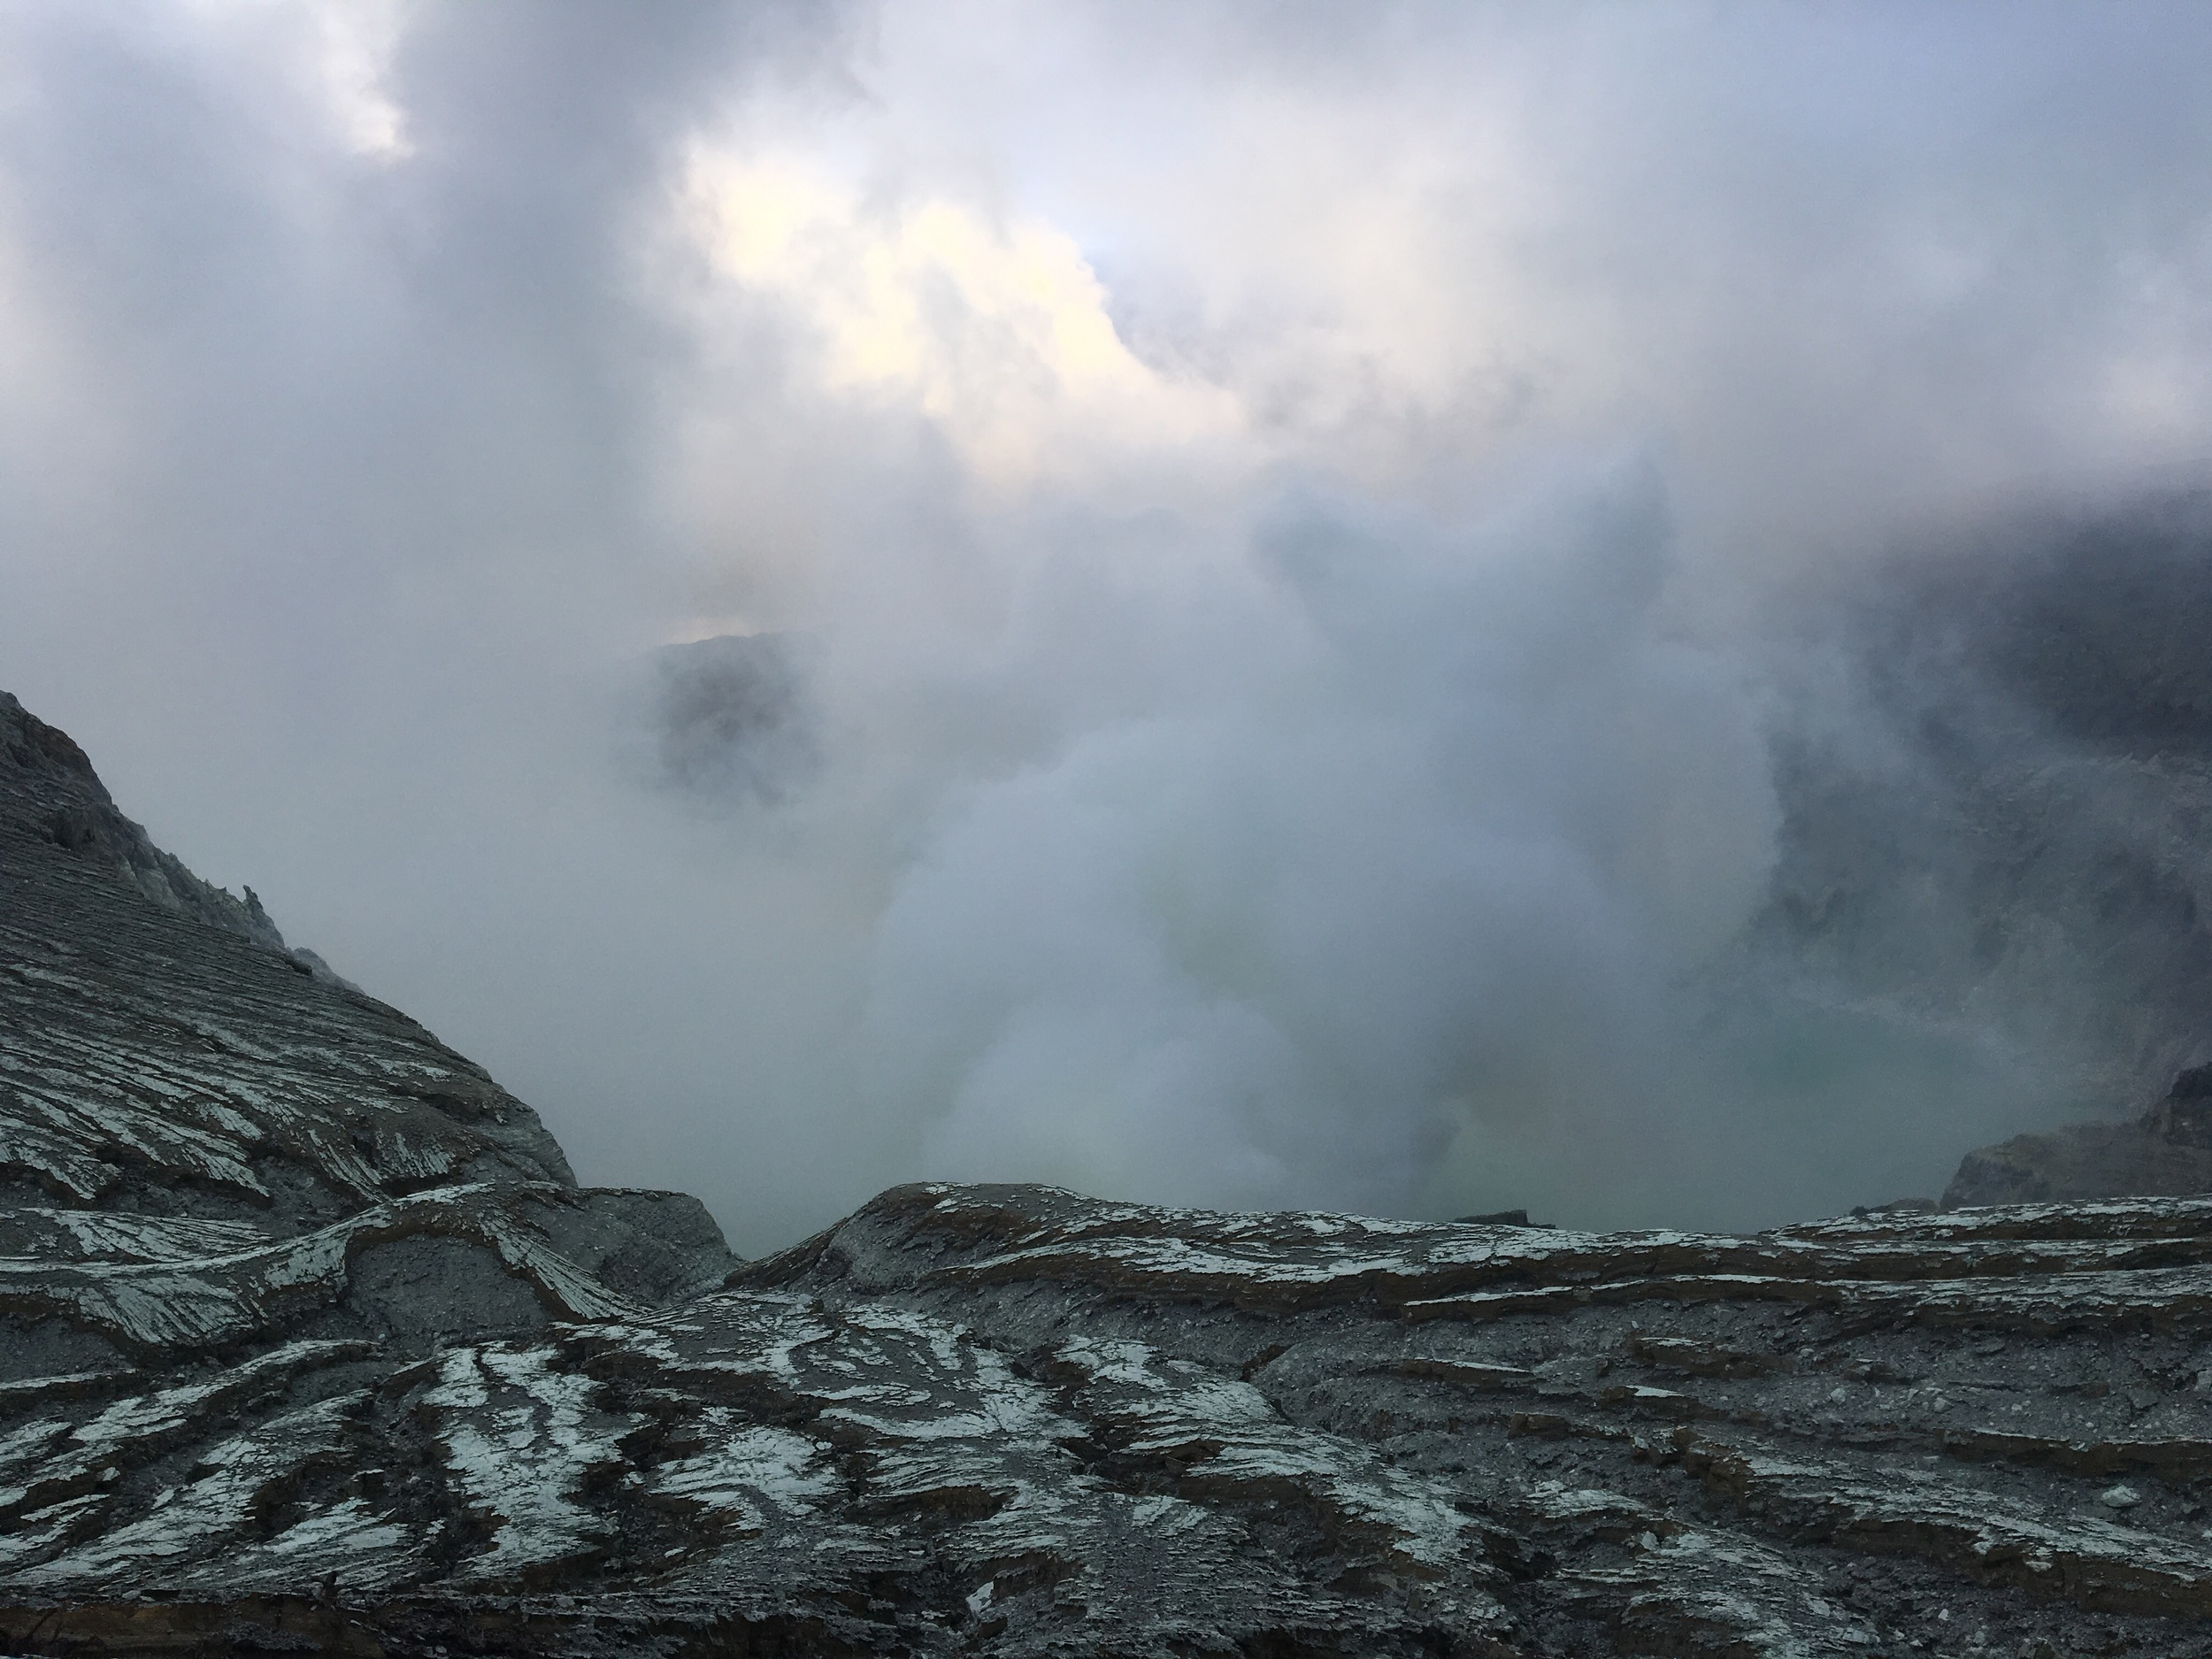 Hiking around the crater